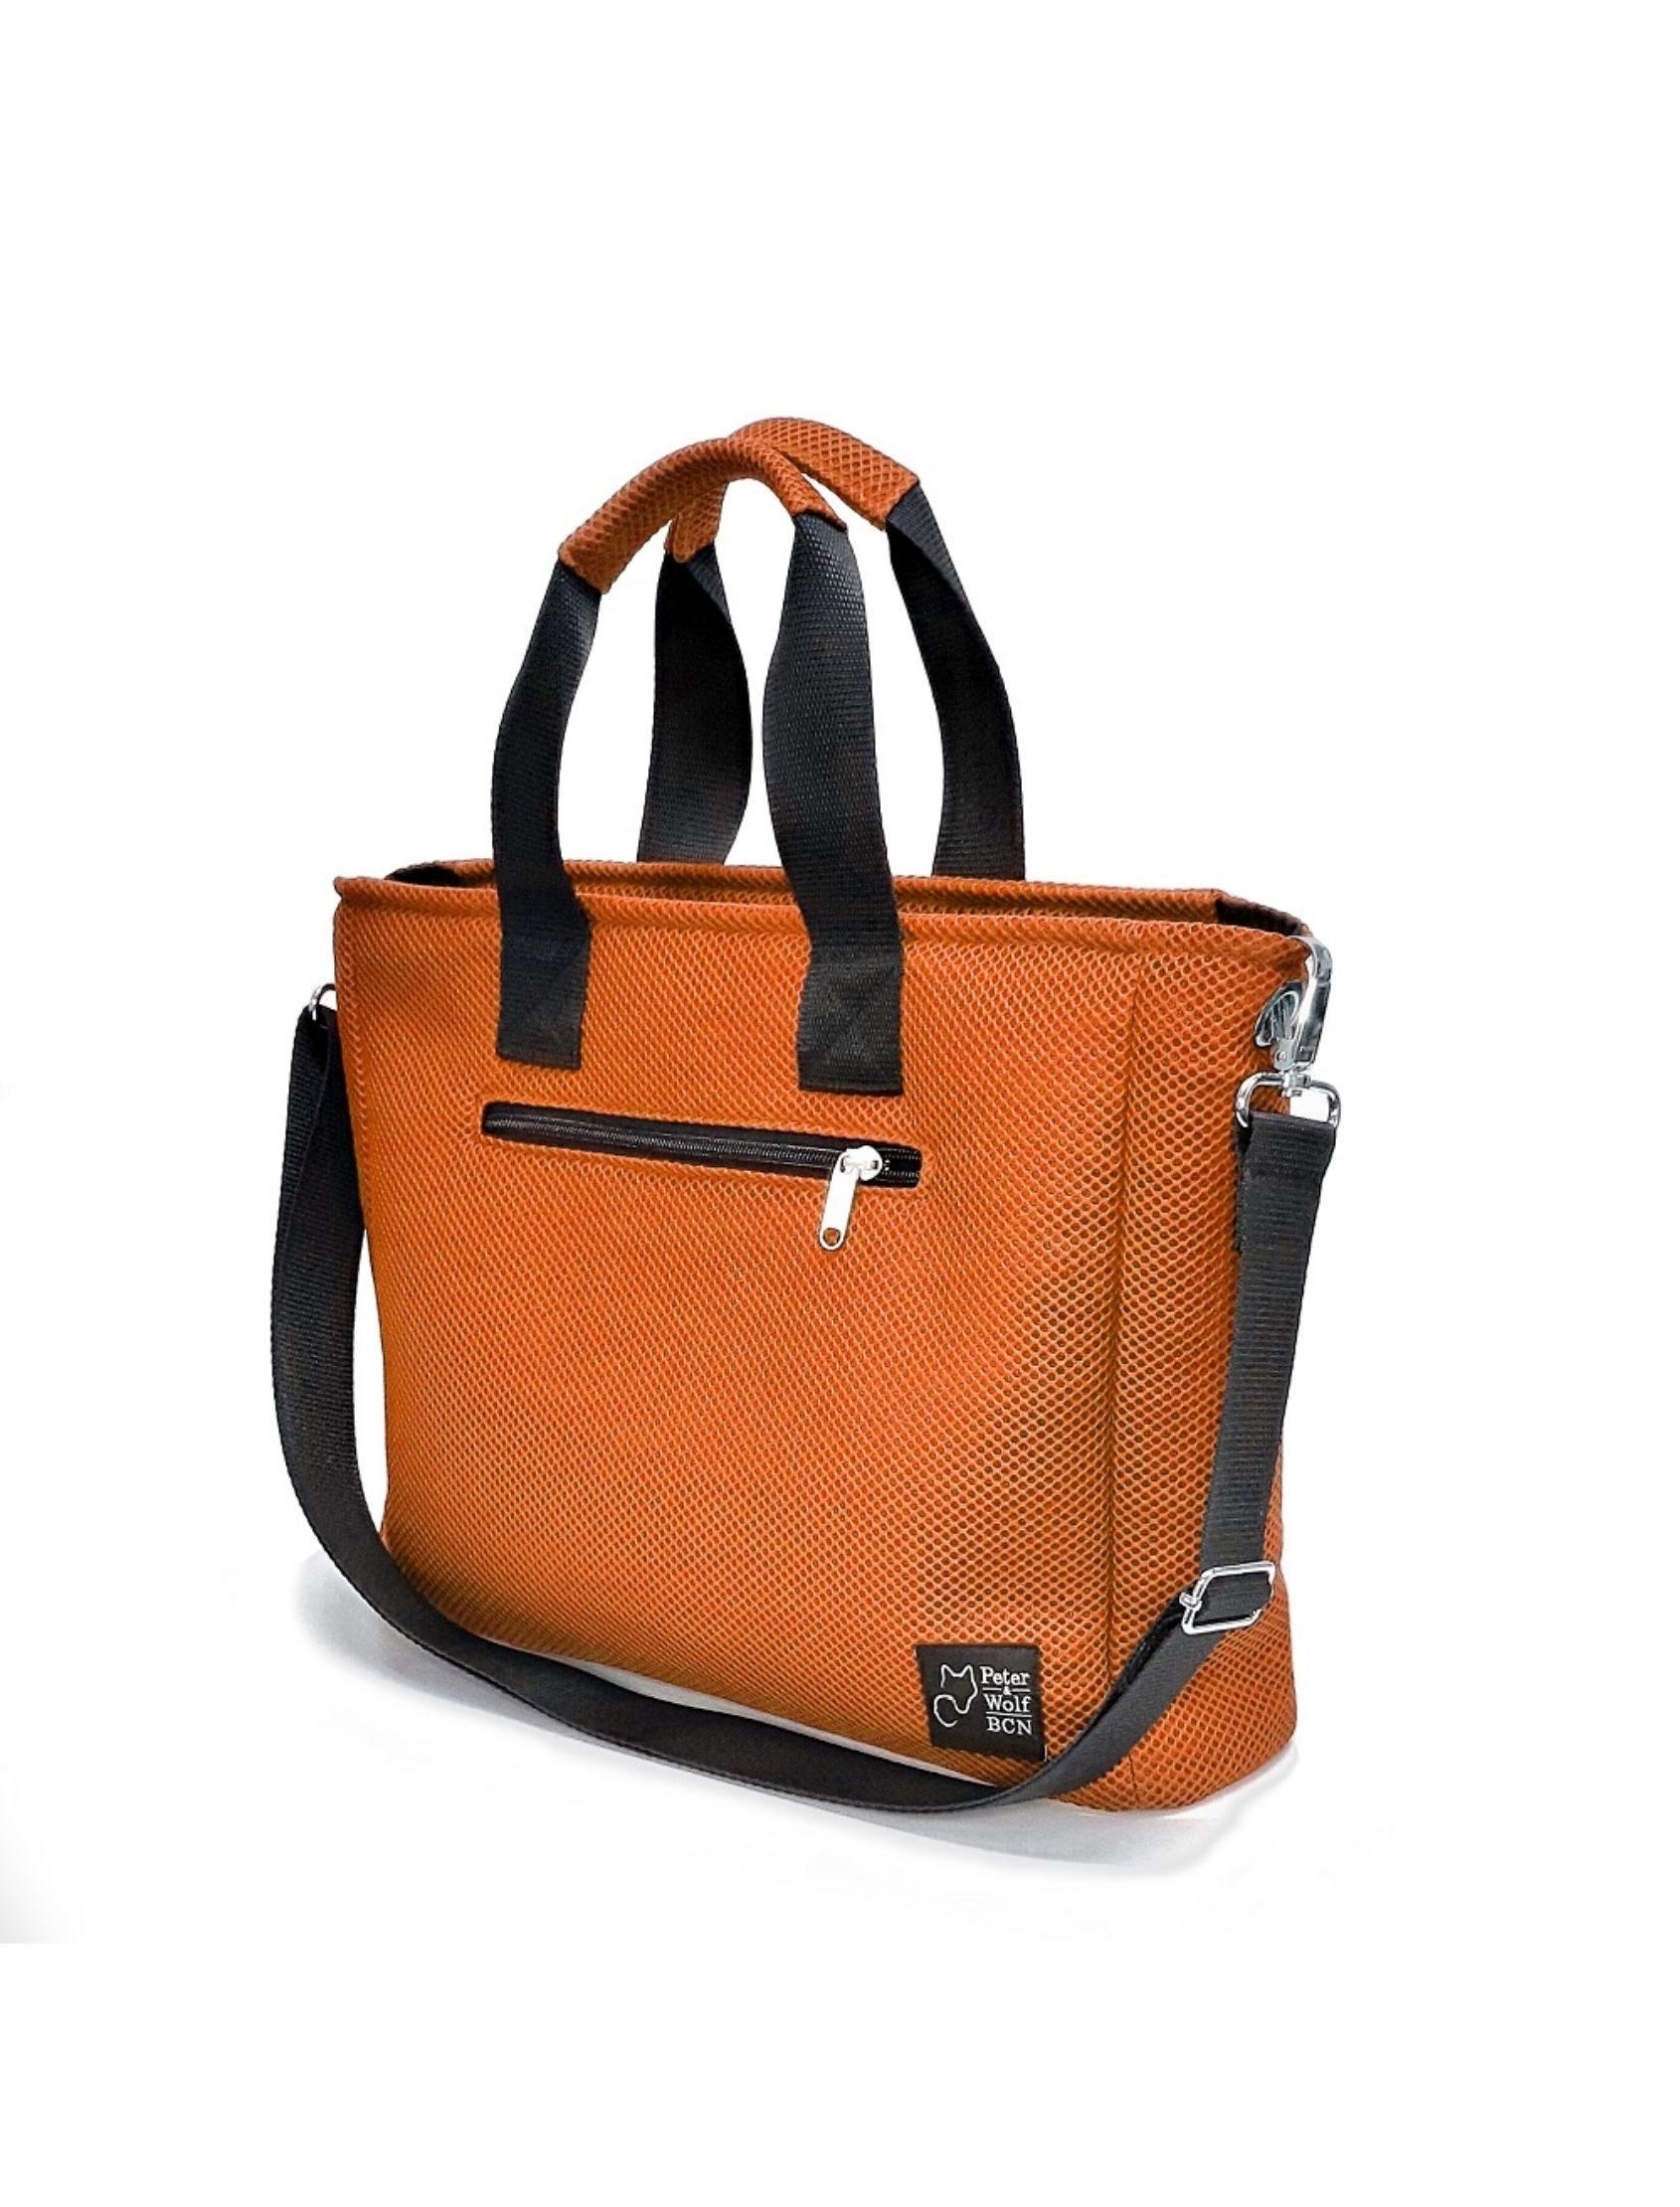 bolso box naranja de peter & wolf con tejido técnico